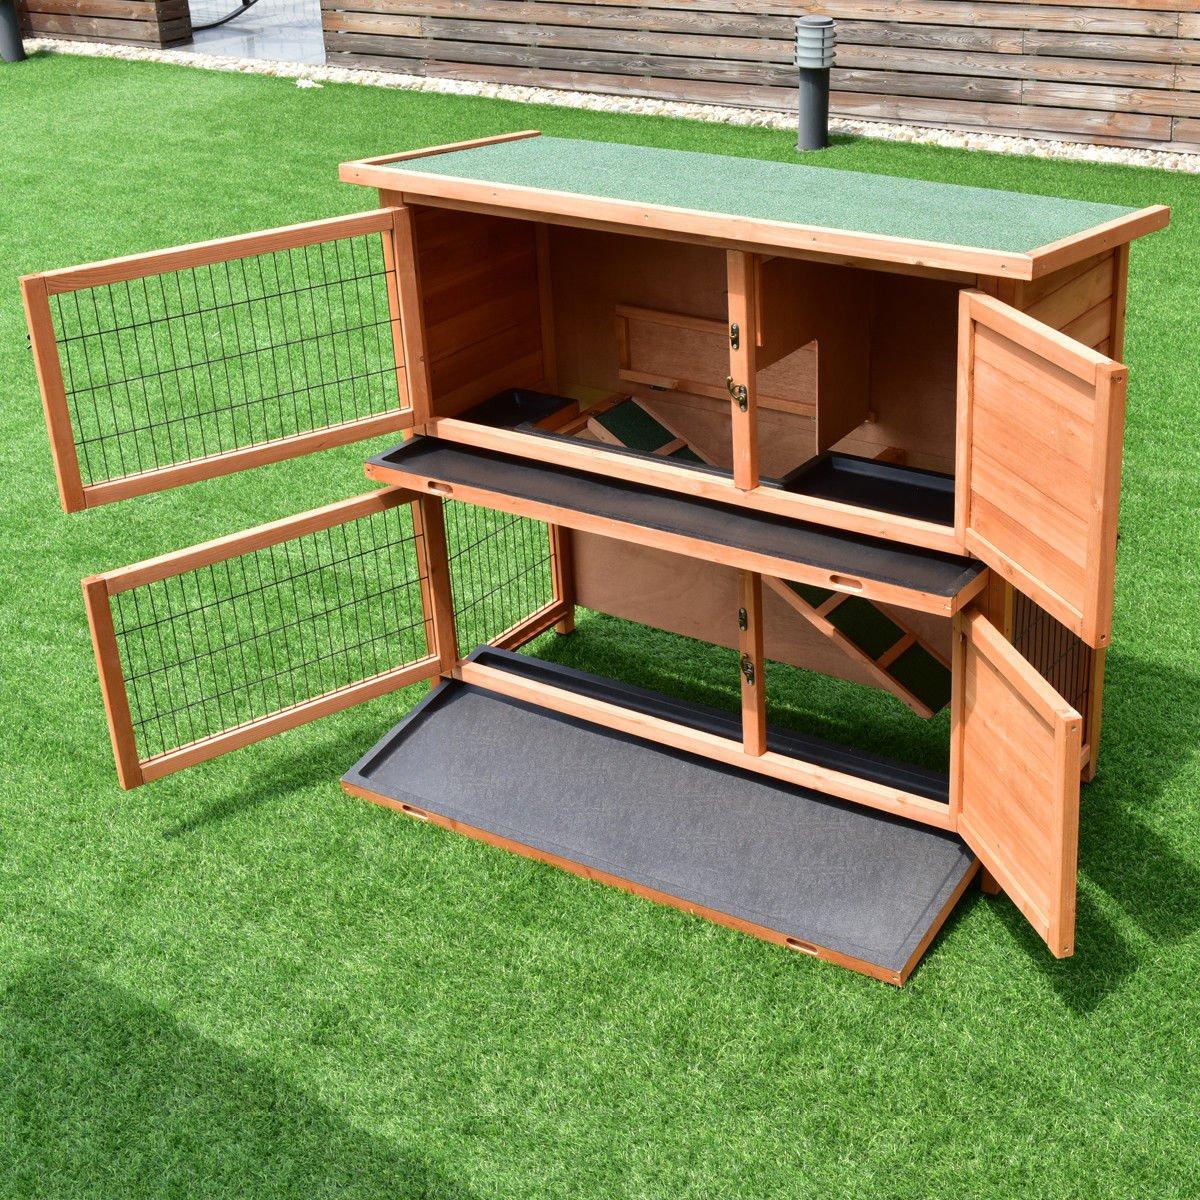 Tangkula Chicken Coop 48'' Rabbit Hutch Wooden Garden Backyard Bunny Hen House Pet Supplies with Ladder by Tangkula (Image #2)